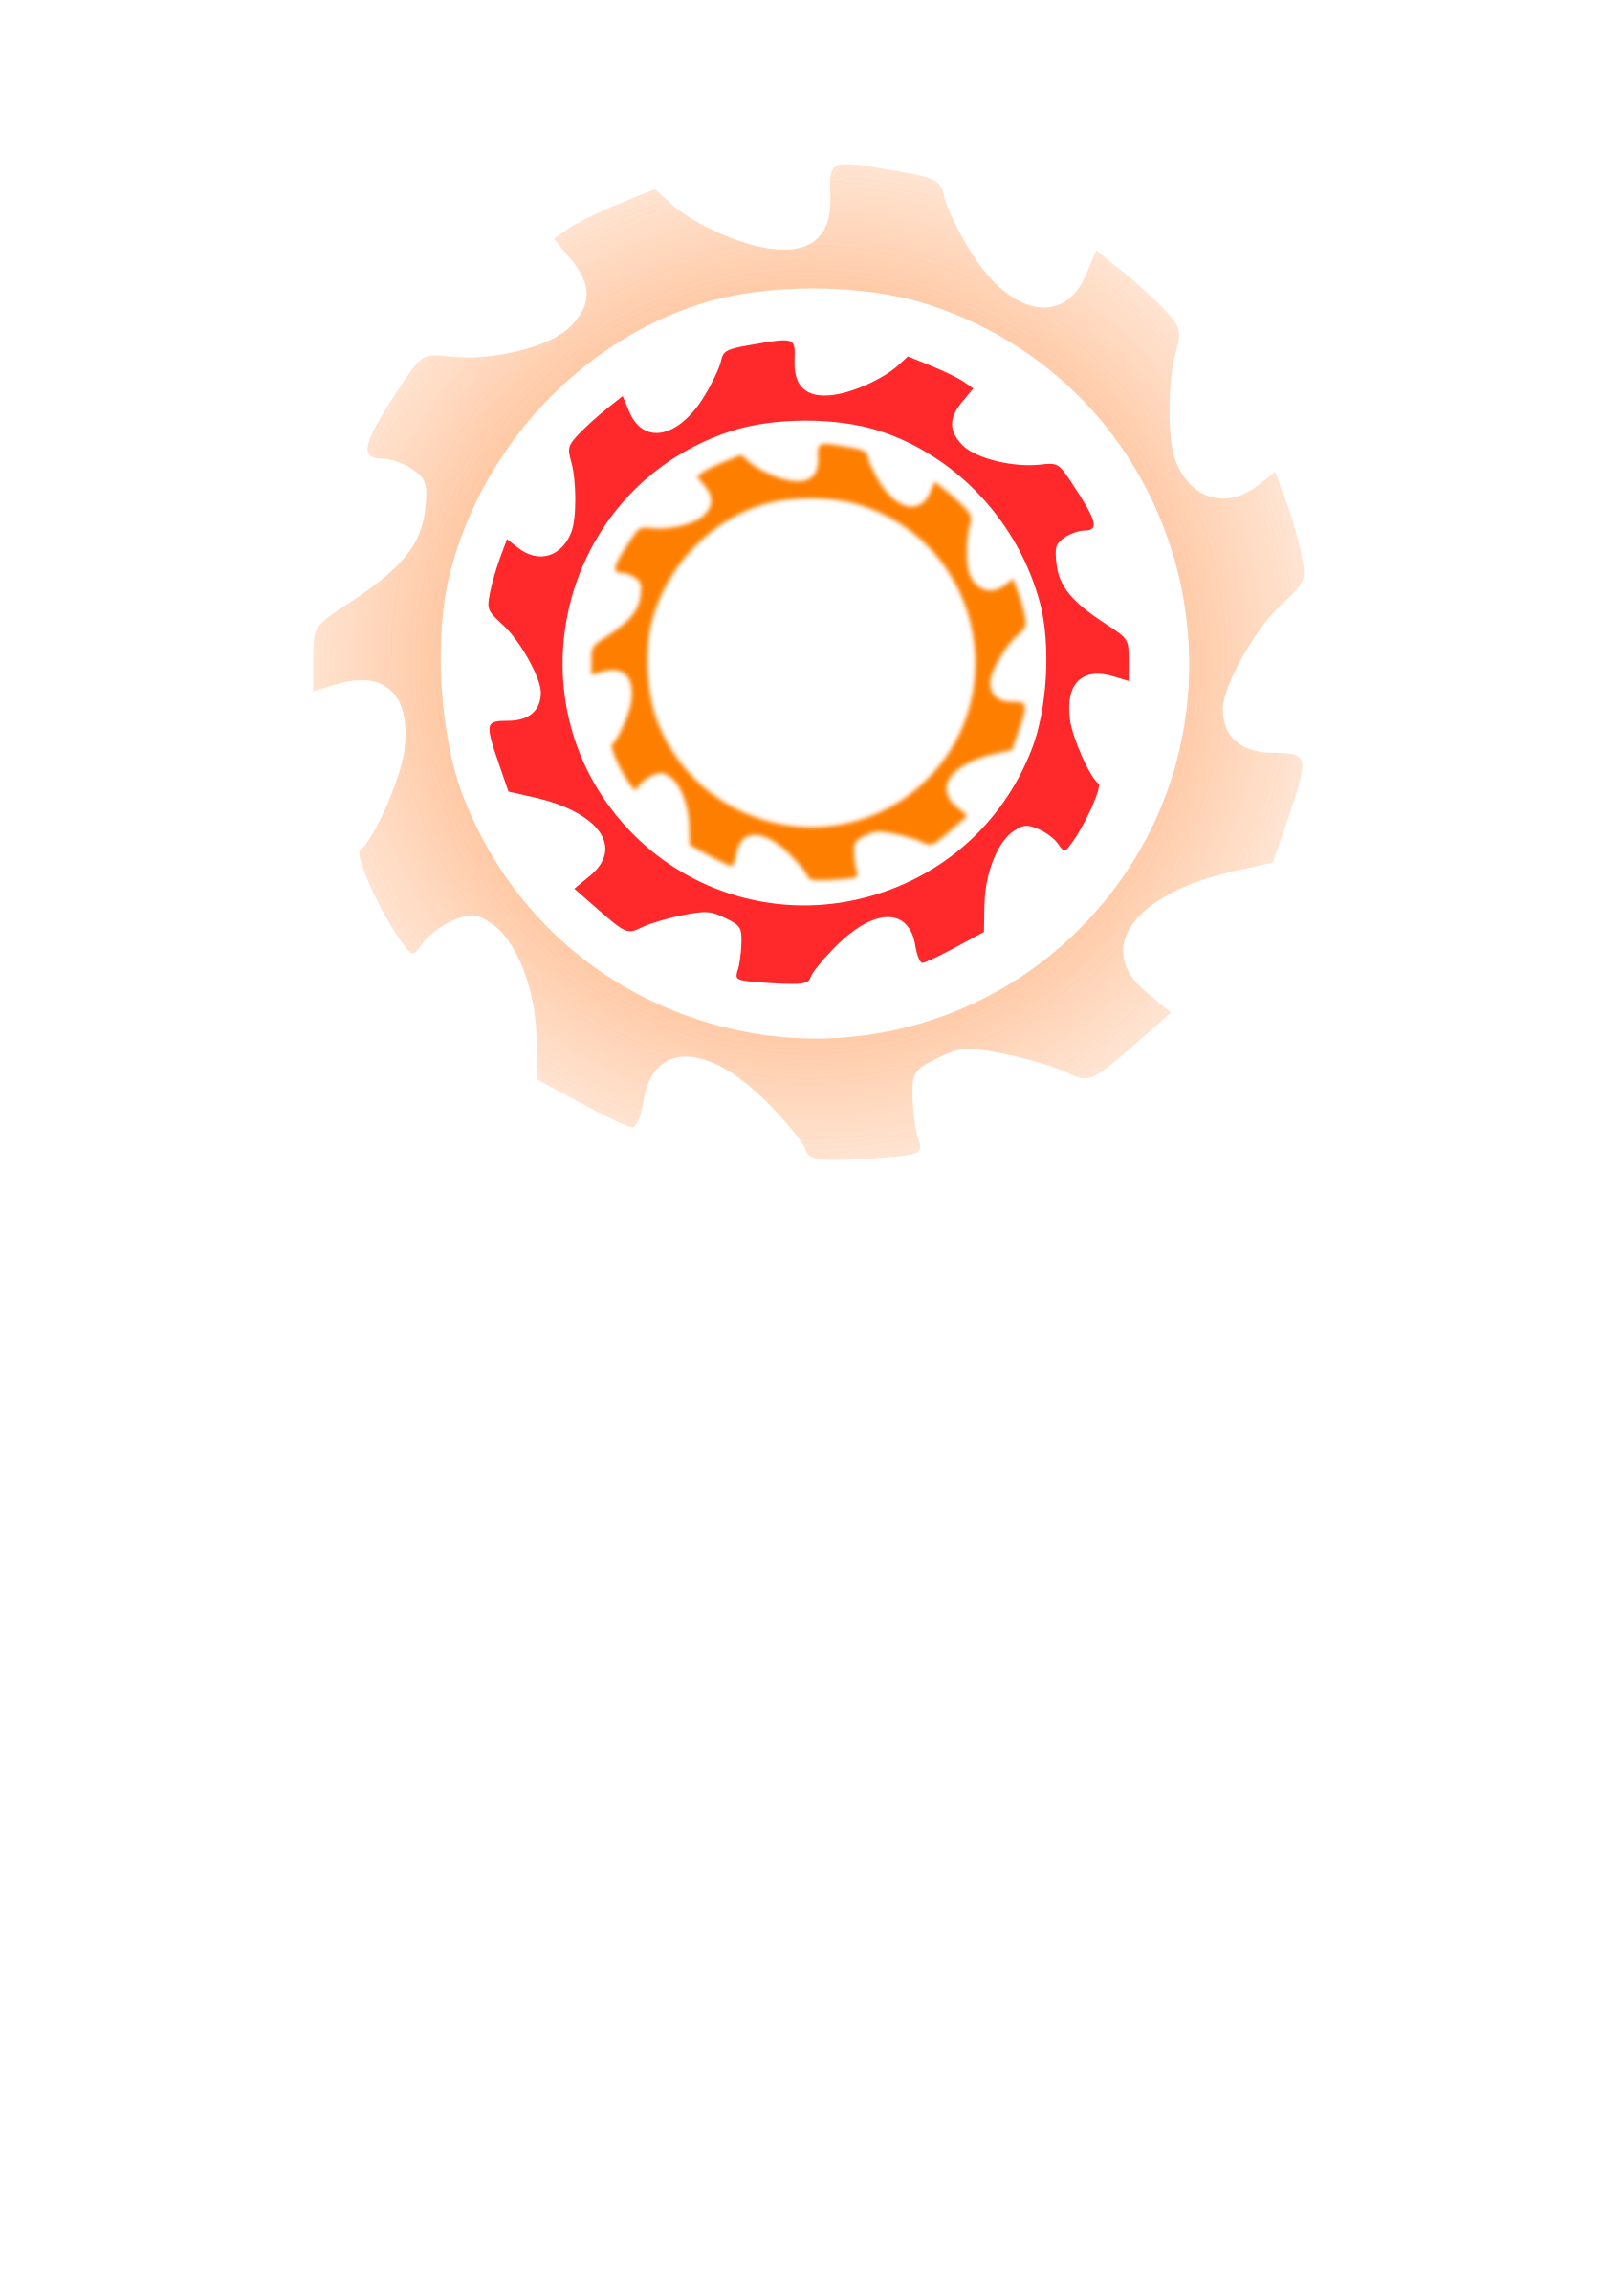 Wheel clipart circle thing. Gear wheels big image